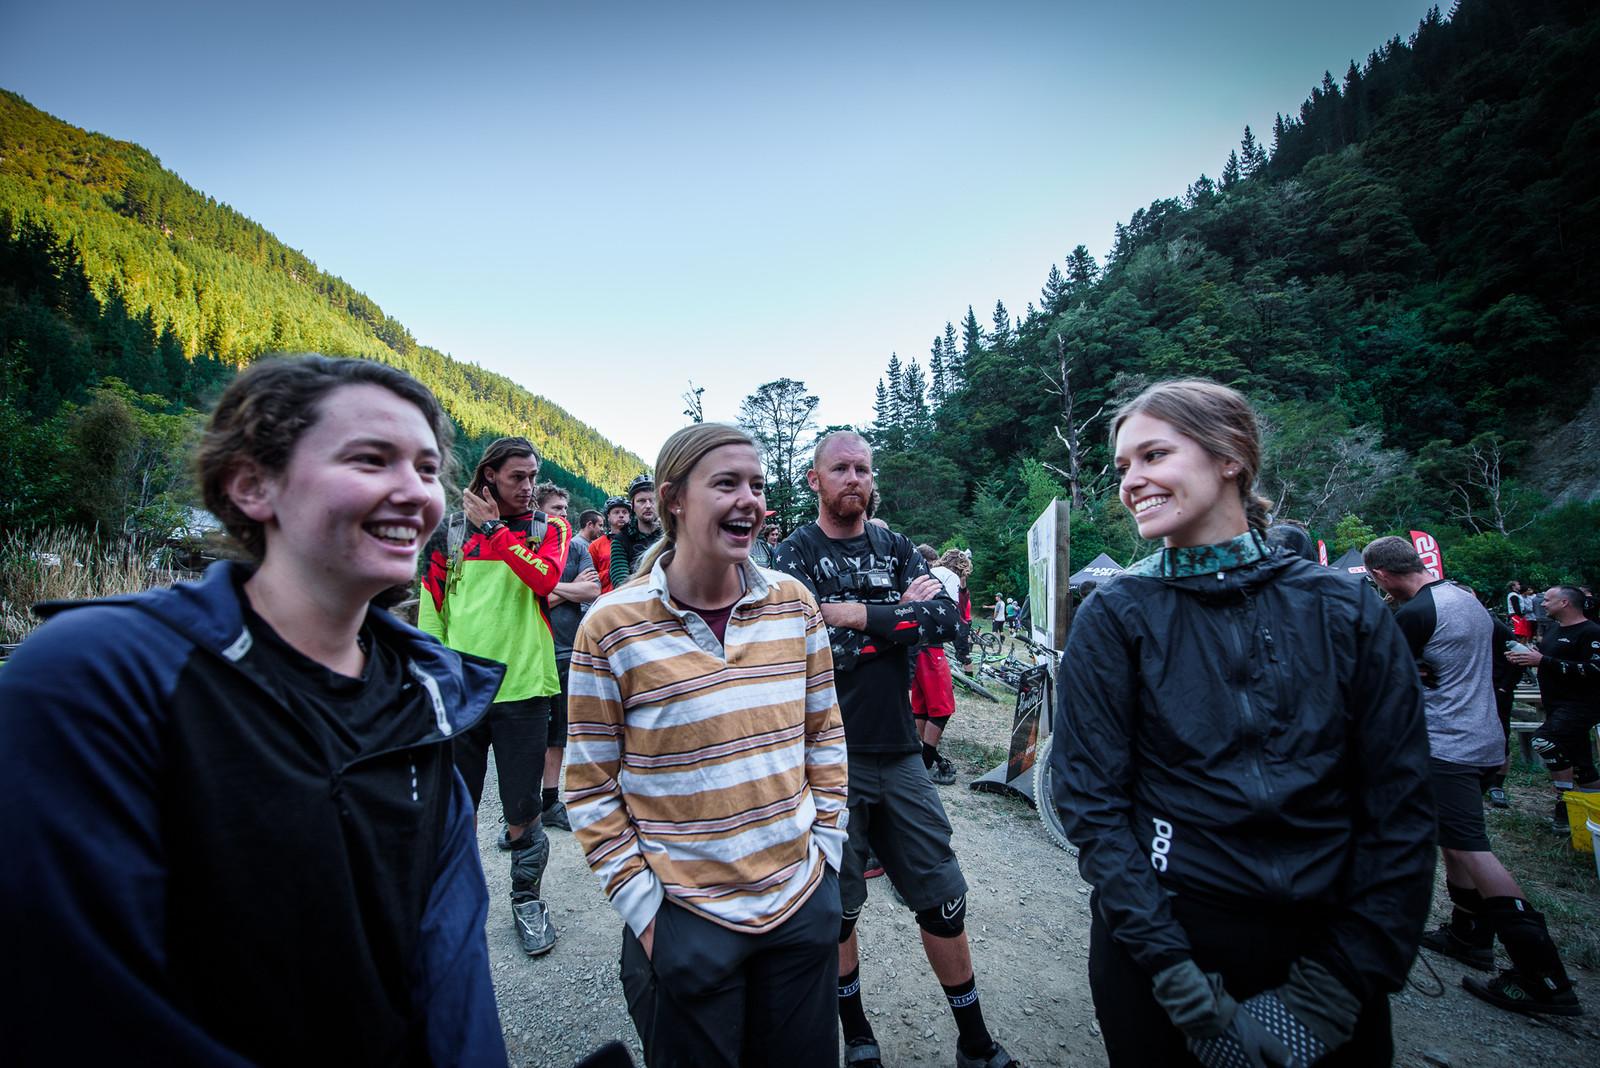 DME Registration - 2019 Dodzy Memorial Enduro - Mountain Biking Pictures - Vital MTB